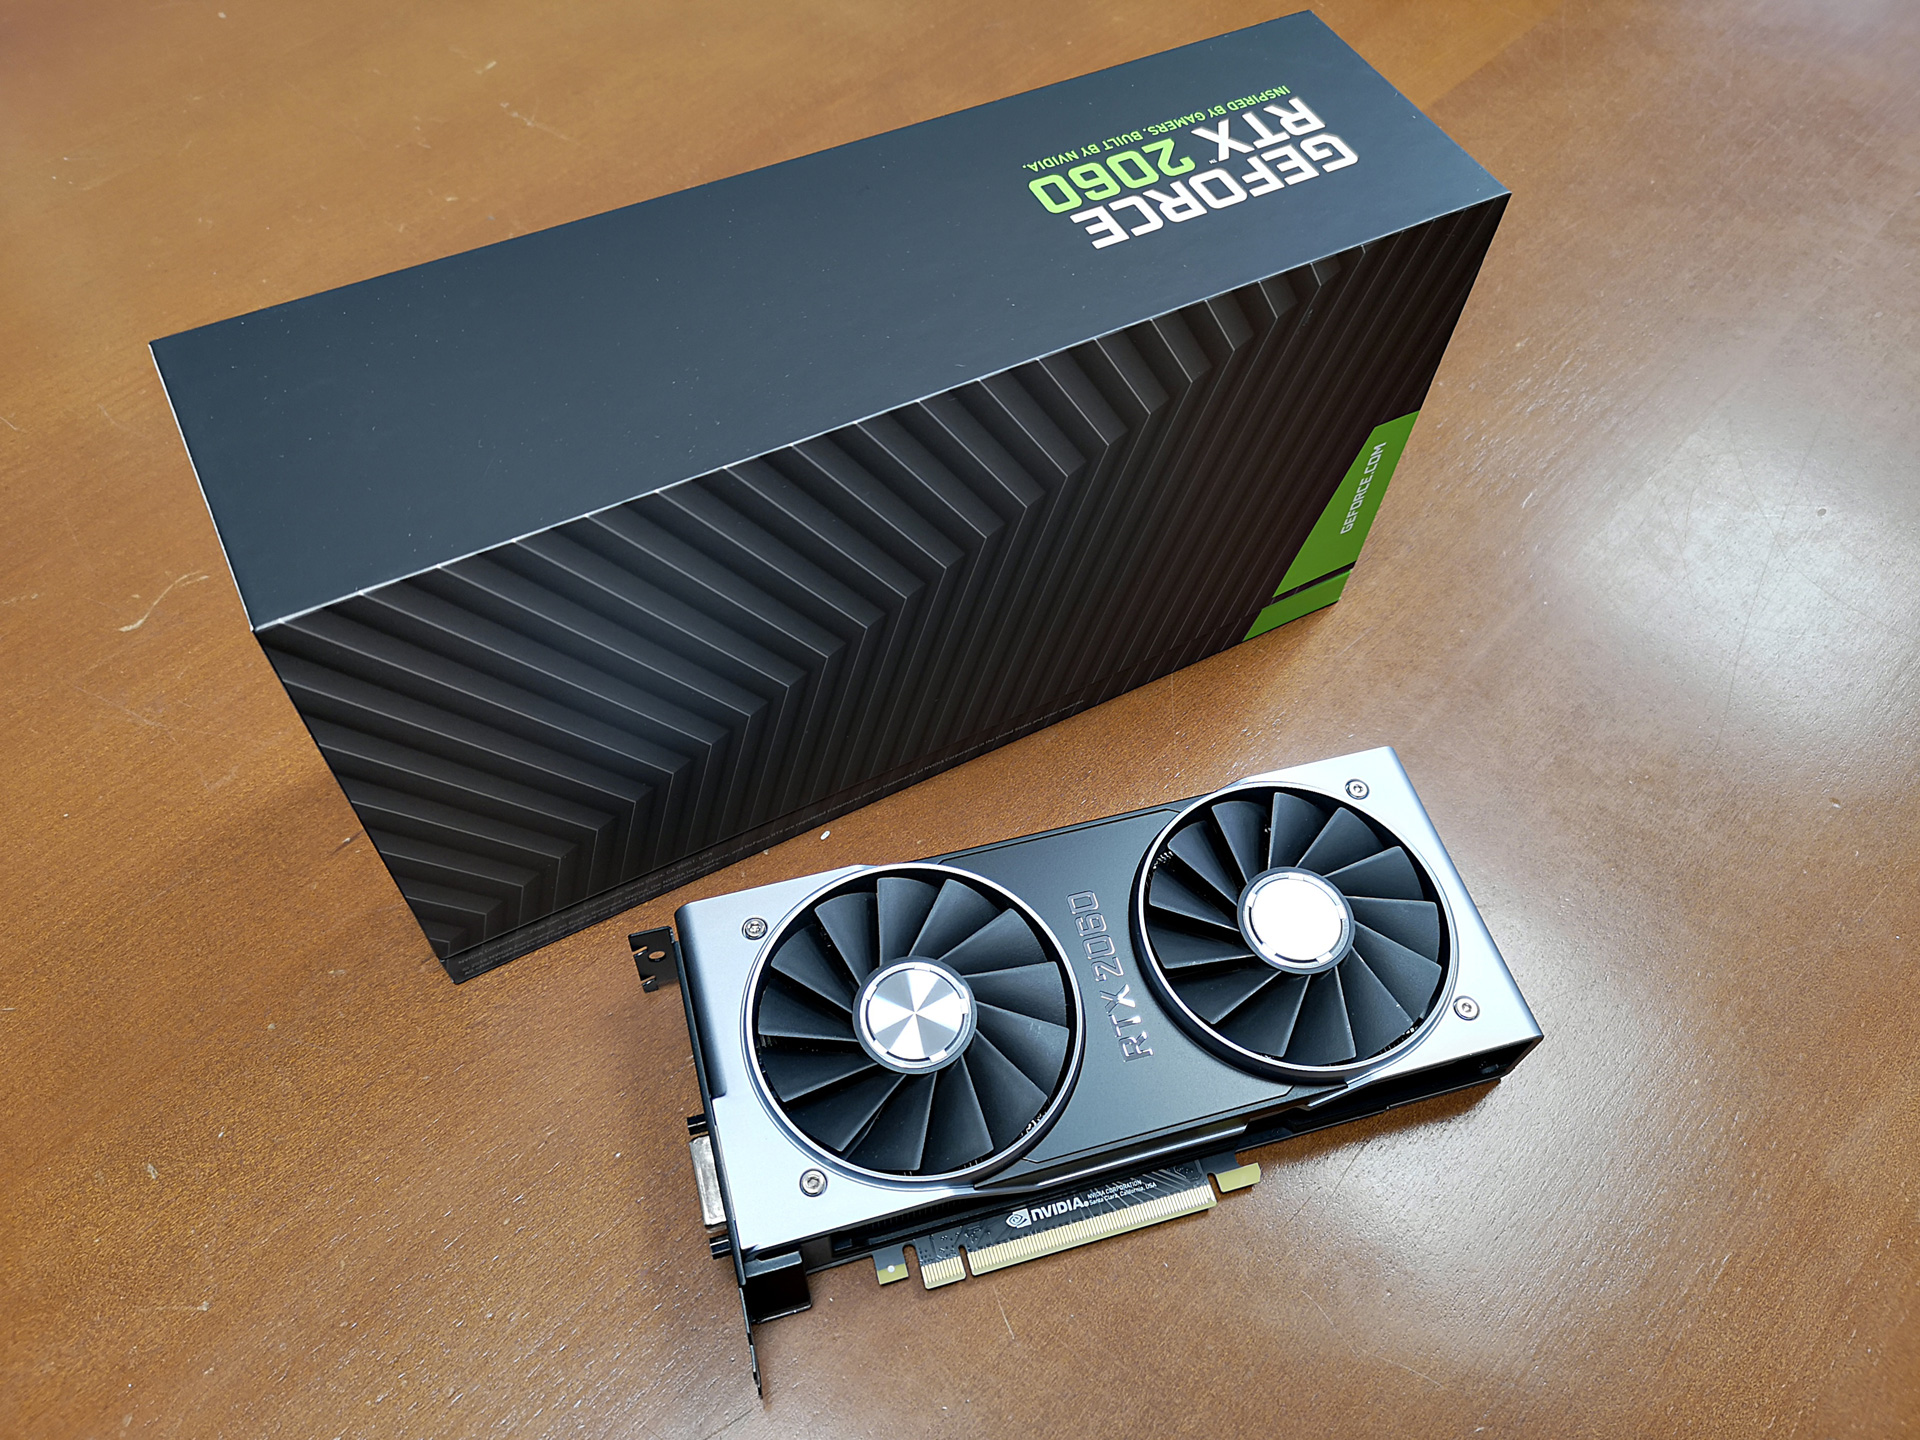 Nvidia Has Announced Their New Mid-Range GeForce RTX 2060 GPUs